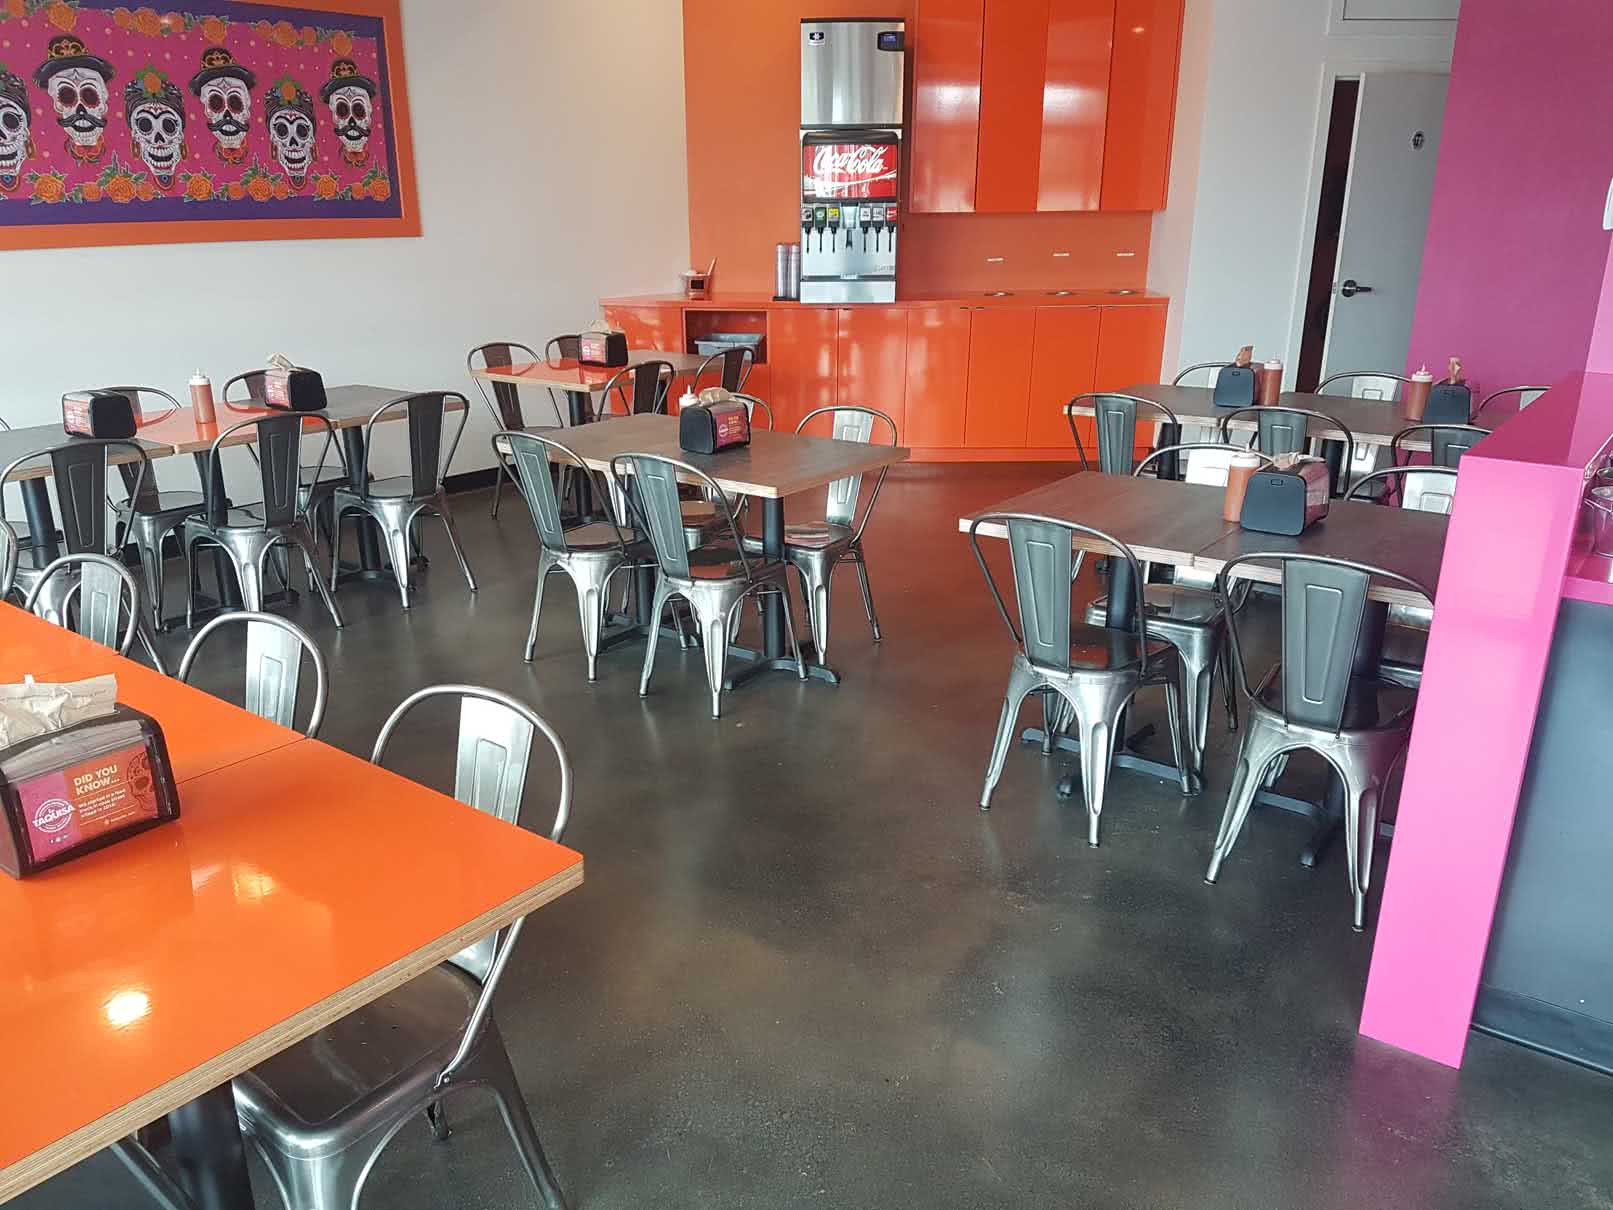 Epoxy concrete floor coating at La Taquisa